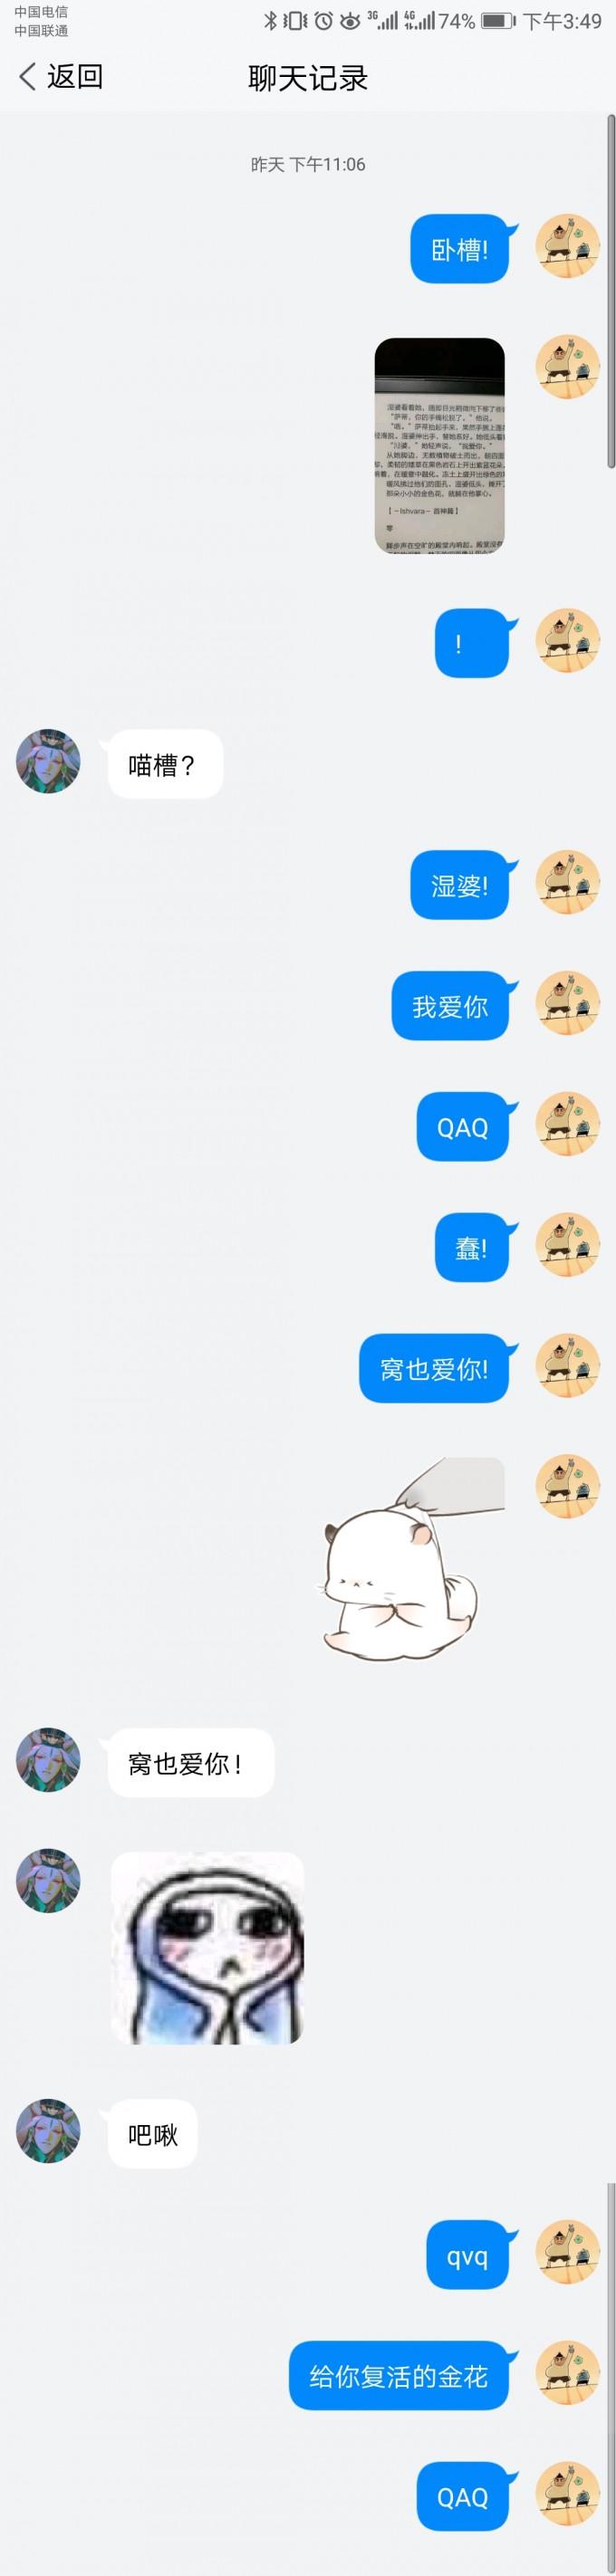 Screenshot 2018 12 28 15 49 15